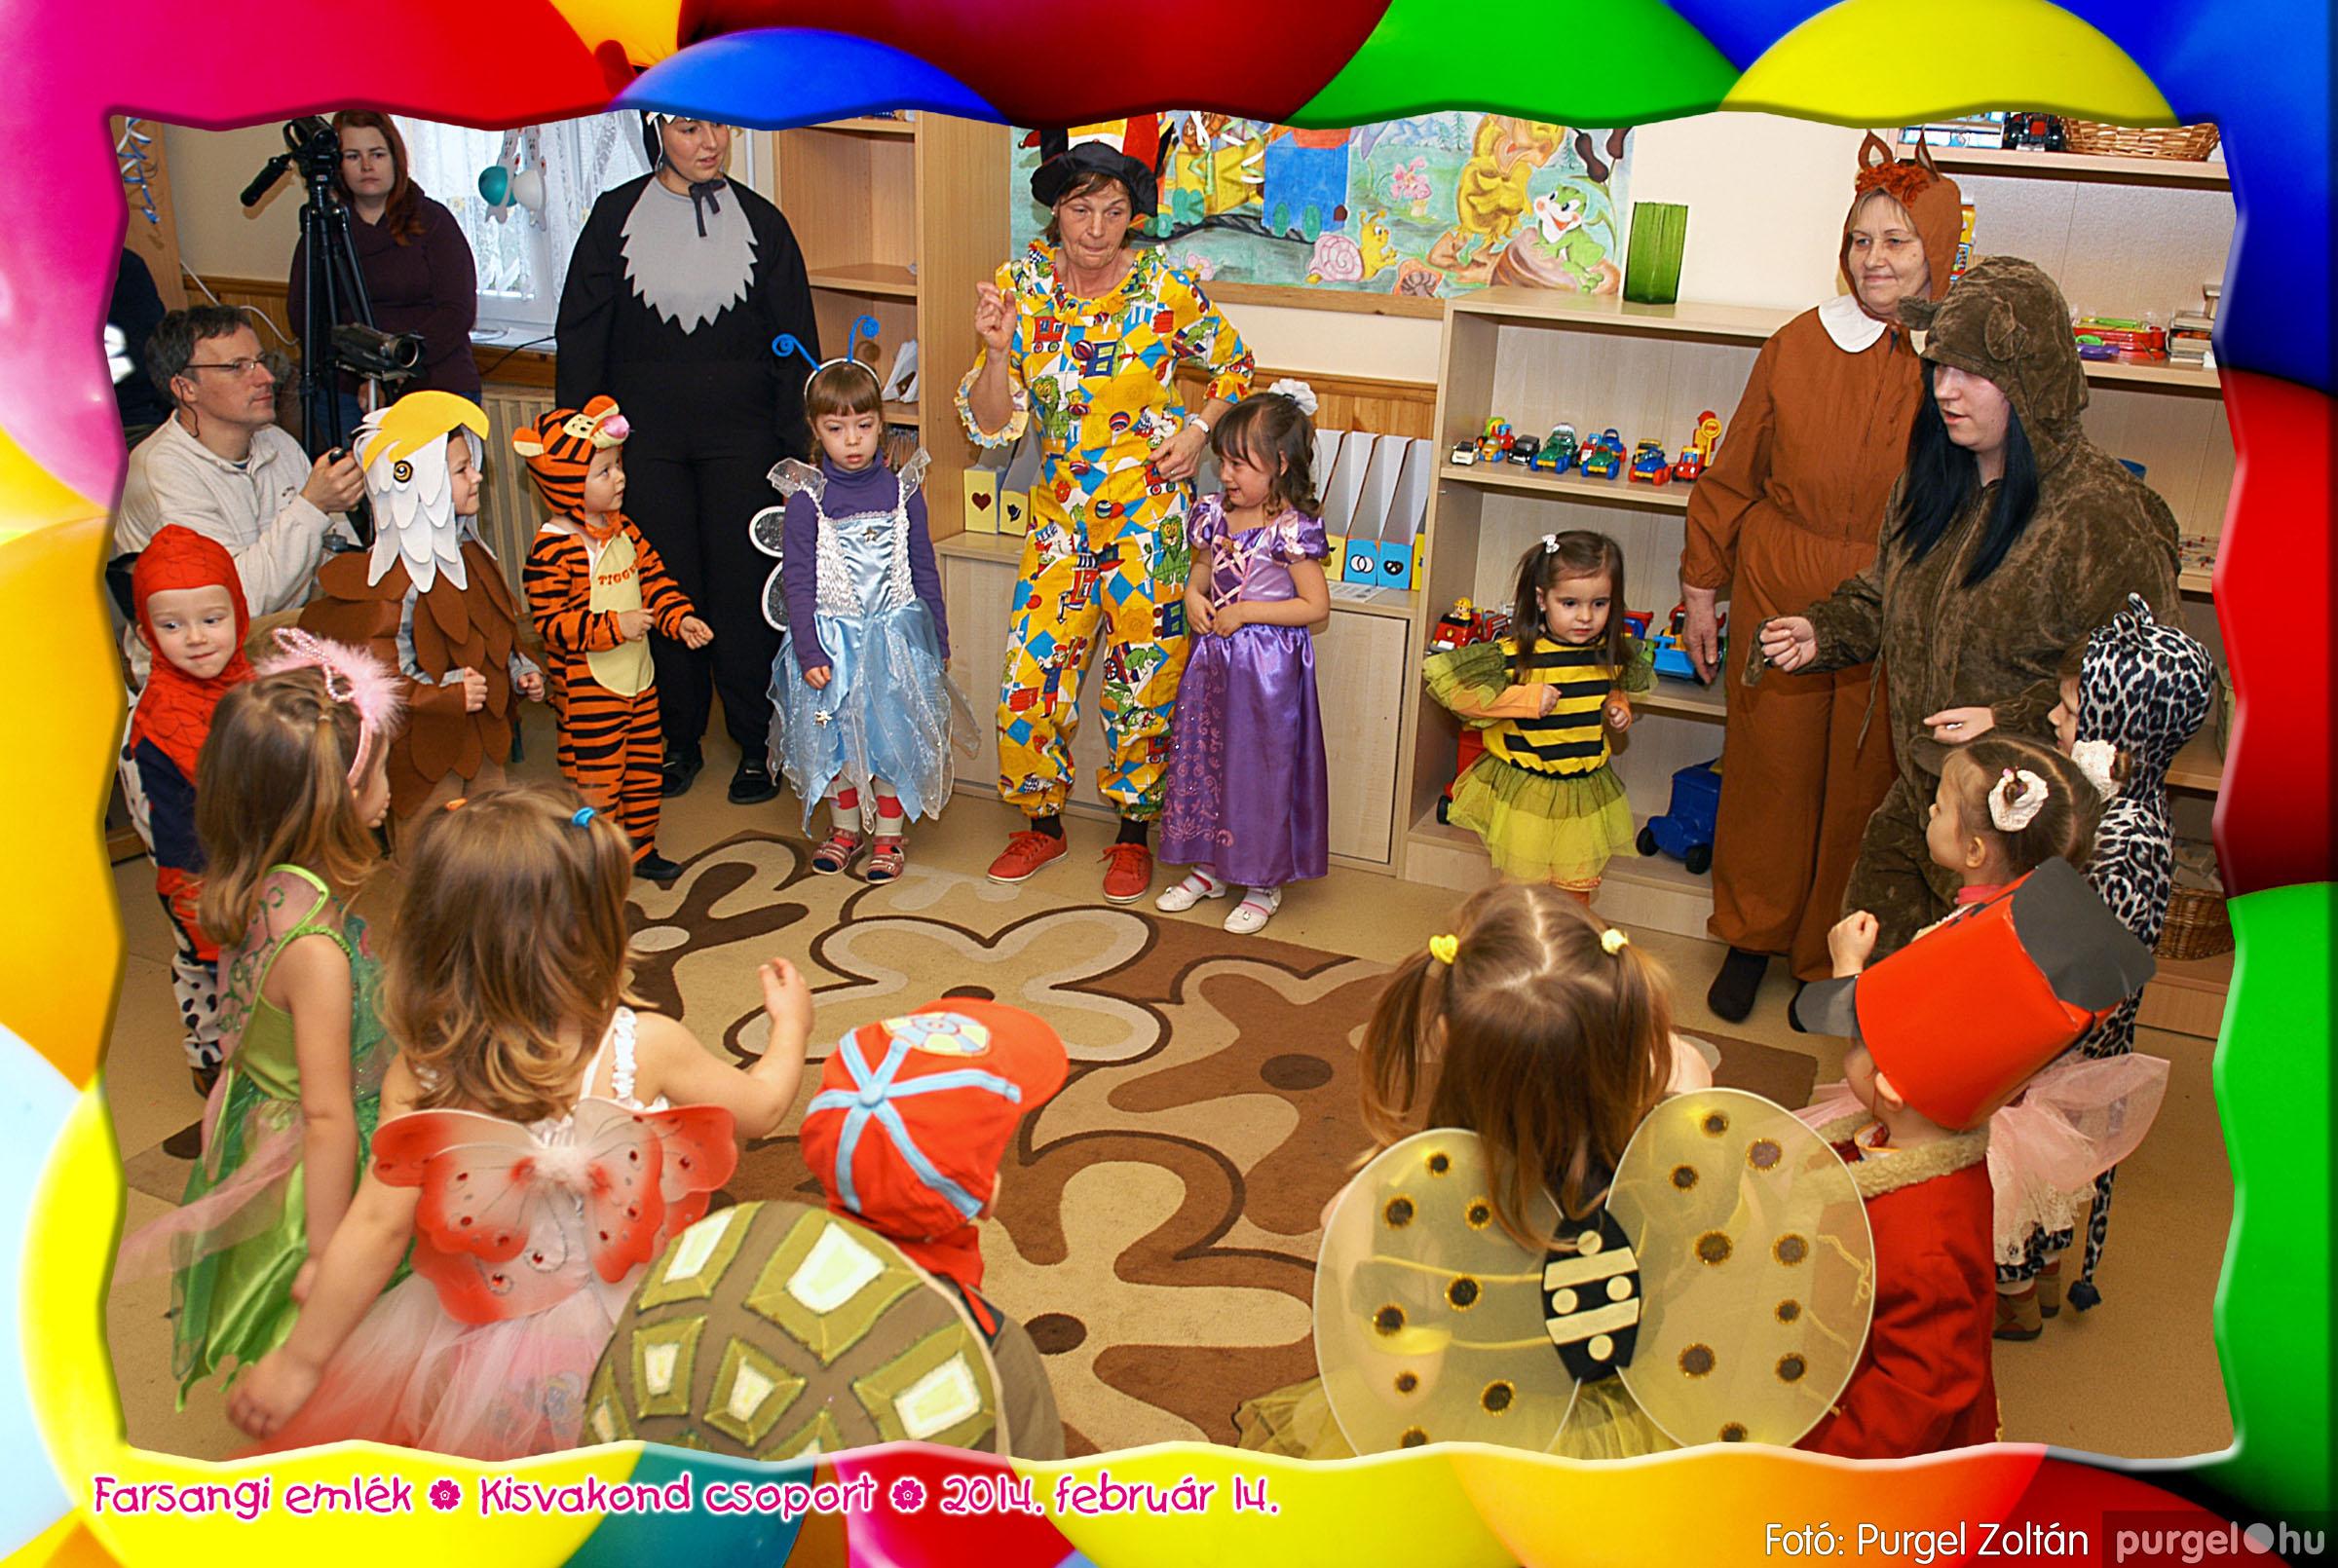 2014.02.14. 210 Kurca-parti Óvoda farsang 2014. - Kisvakond csoport - Fotó:PURGEL ZOLTÁN© 430.jpg